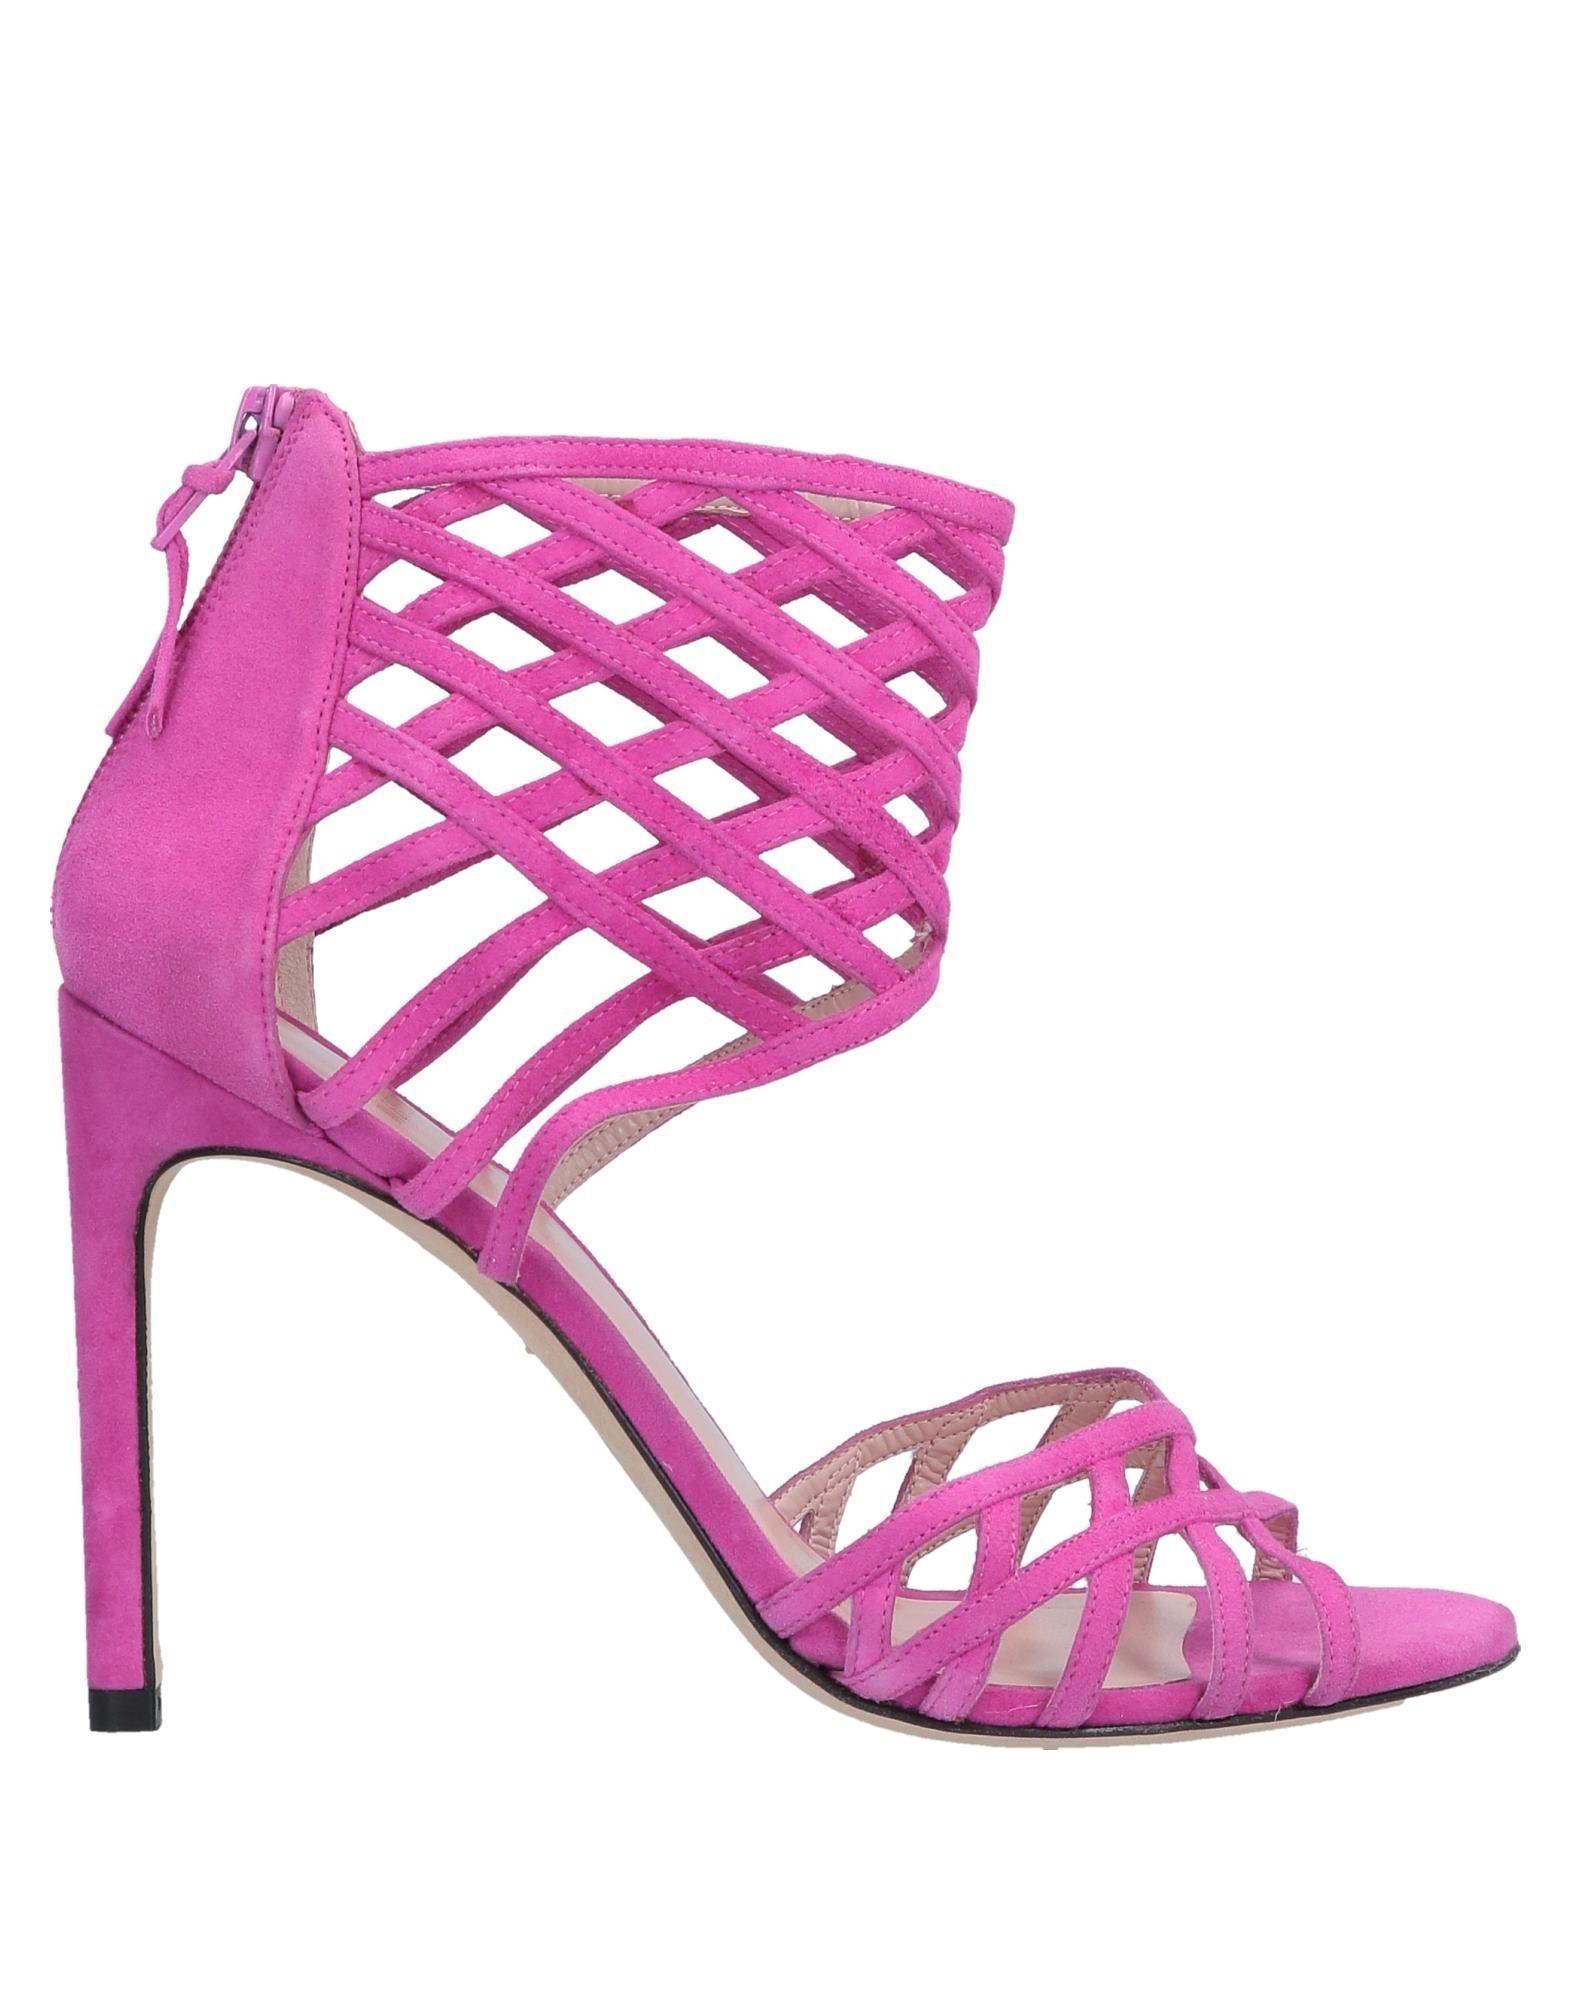 Stuart Weitzman Fuchsia Leather Sandals